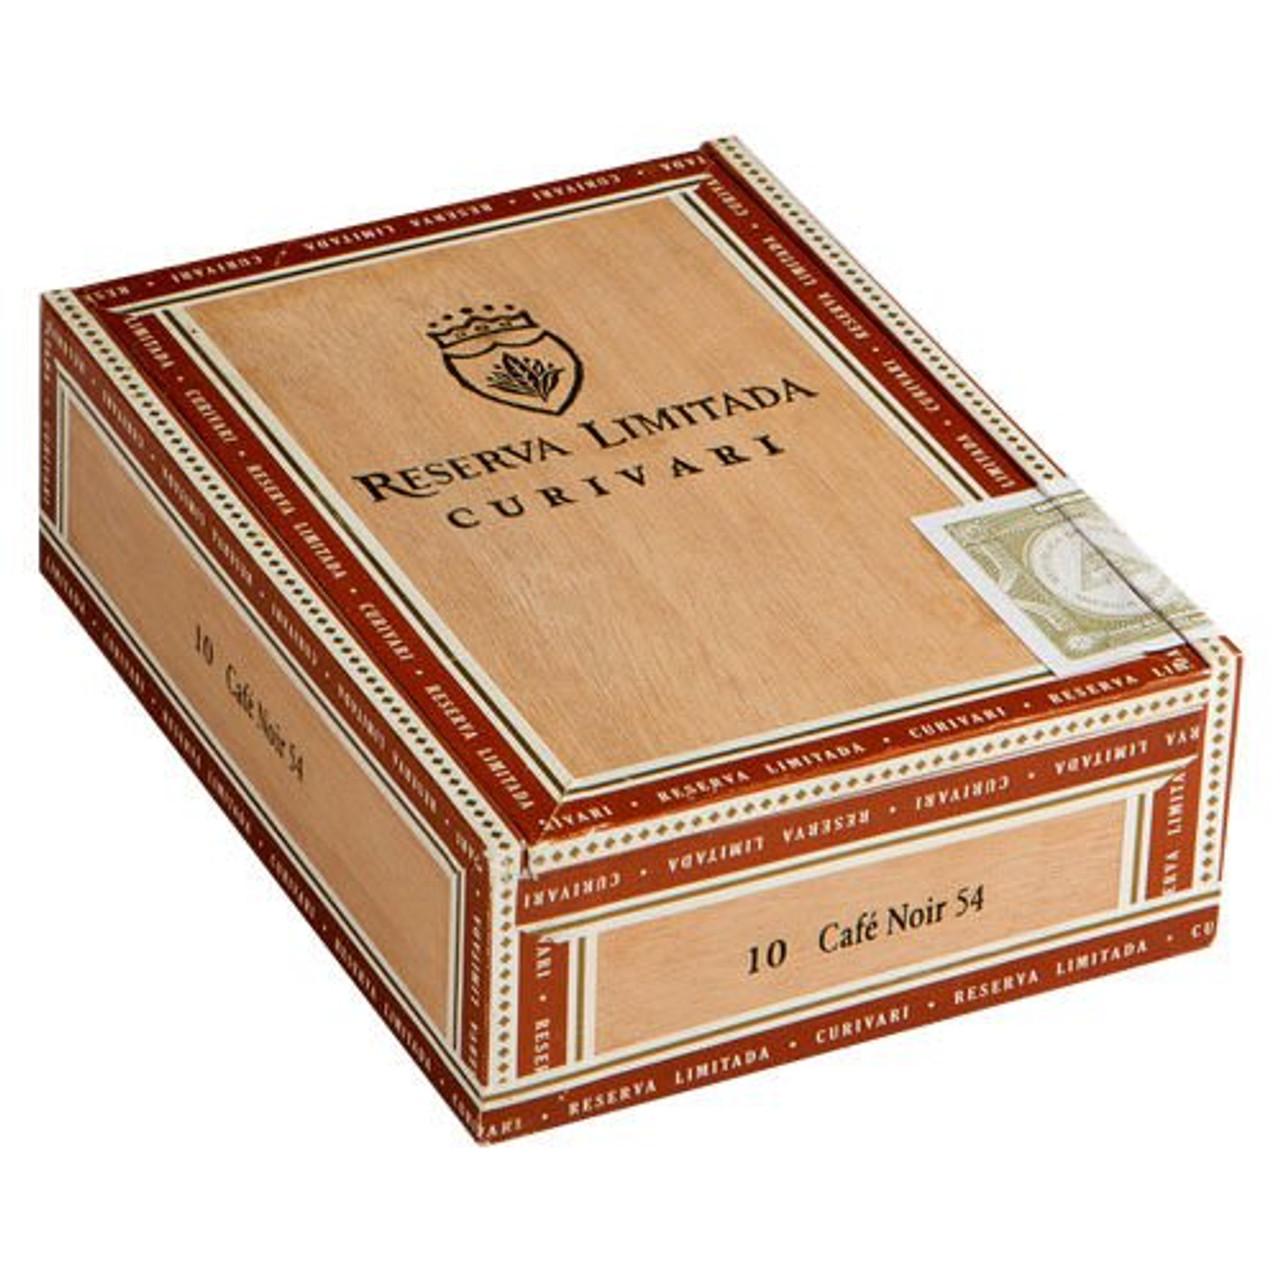 Curivari Reserva Limitada Cafe Petit Corona Cigars - 4.5 x 42 (Box of 10)